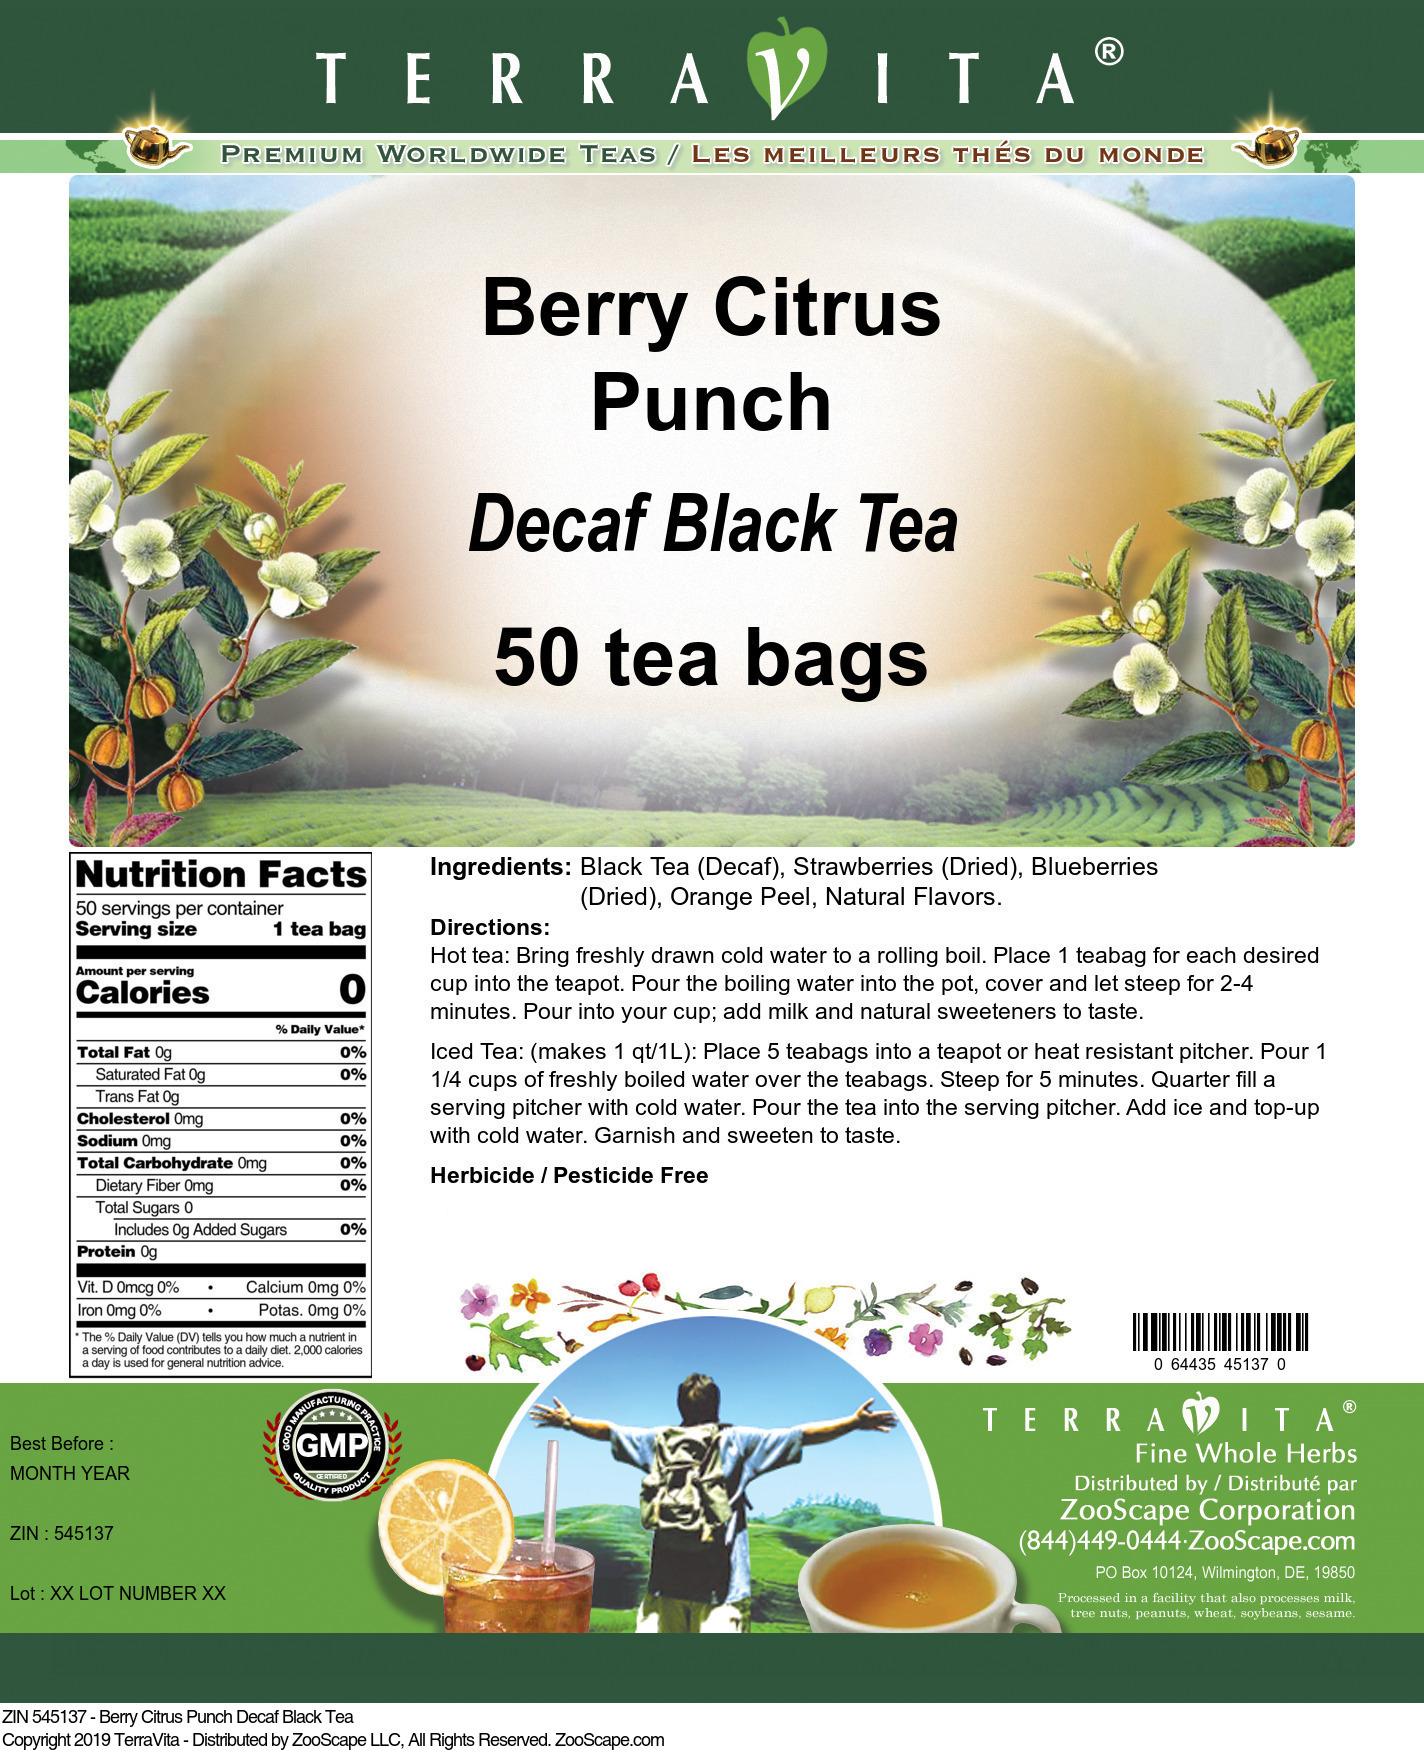 Berry Citrus Punch Decaf Black Tea